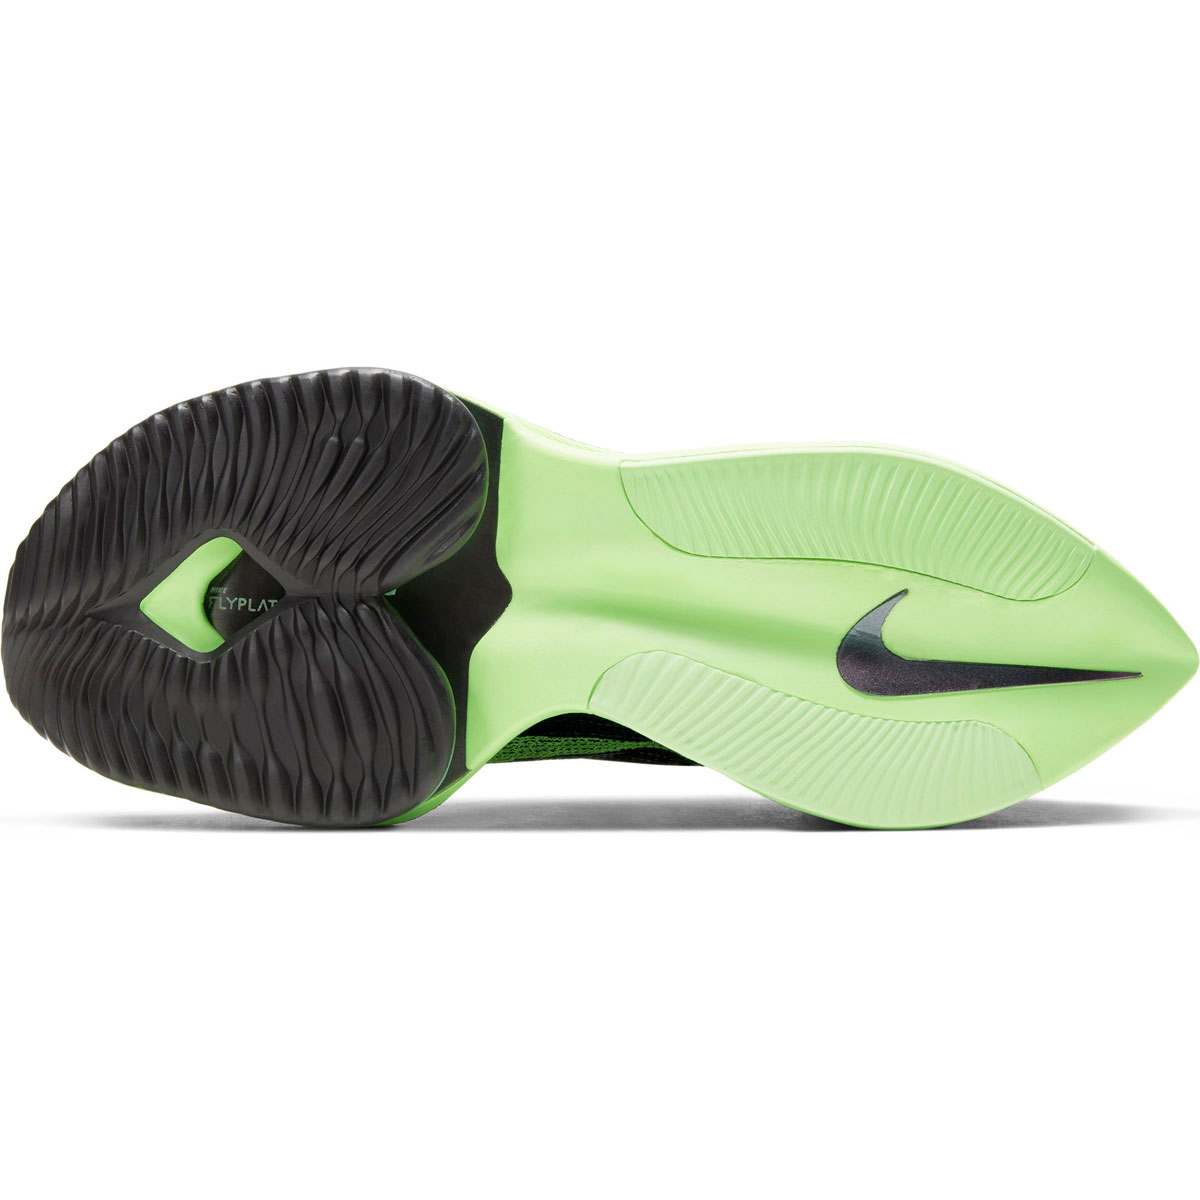 Men's Nike Air Zoom Alphafly Next% Running Shoe - Color: Black/Lime Blast - Size: 6 - Width: Regular, Black/Lime Blast, large, image 3